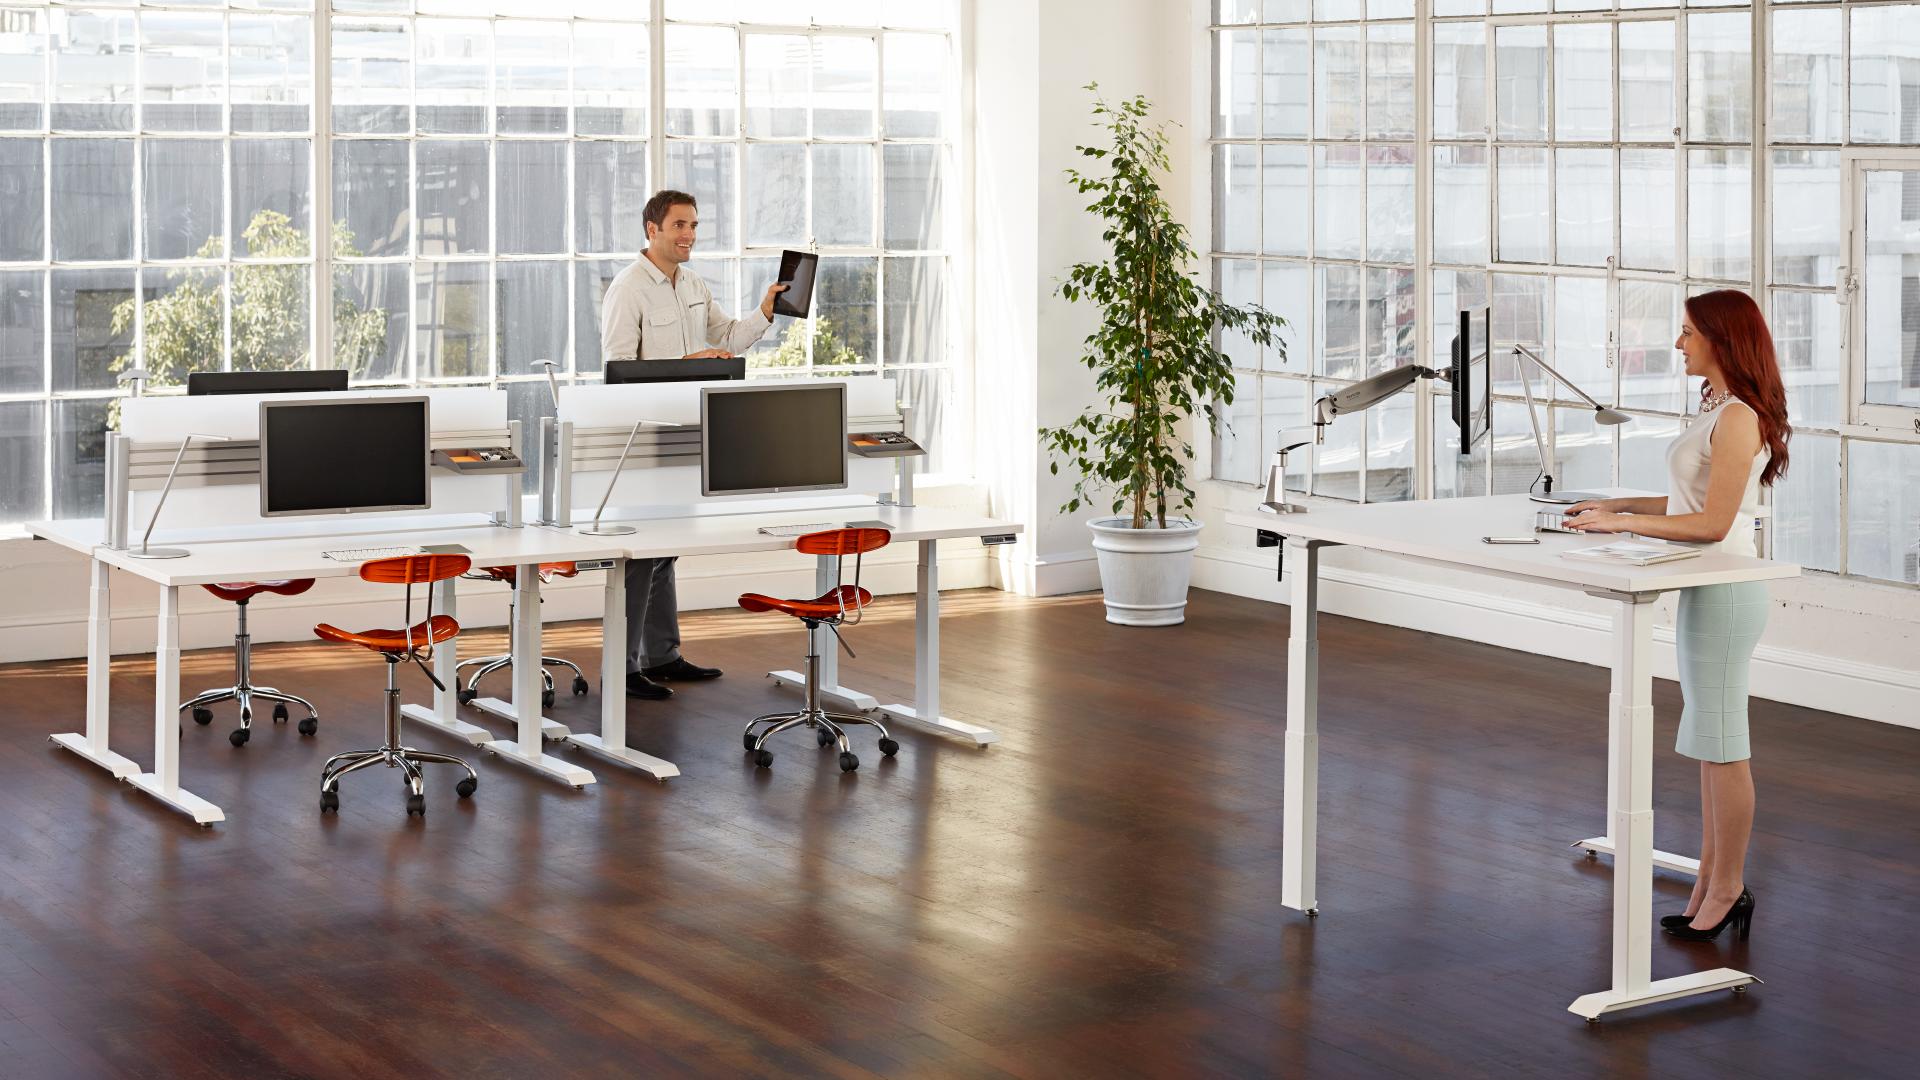 open-office-interior-design-work-elevated